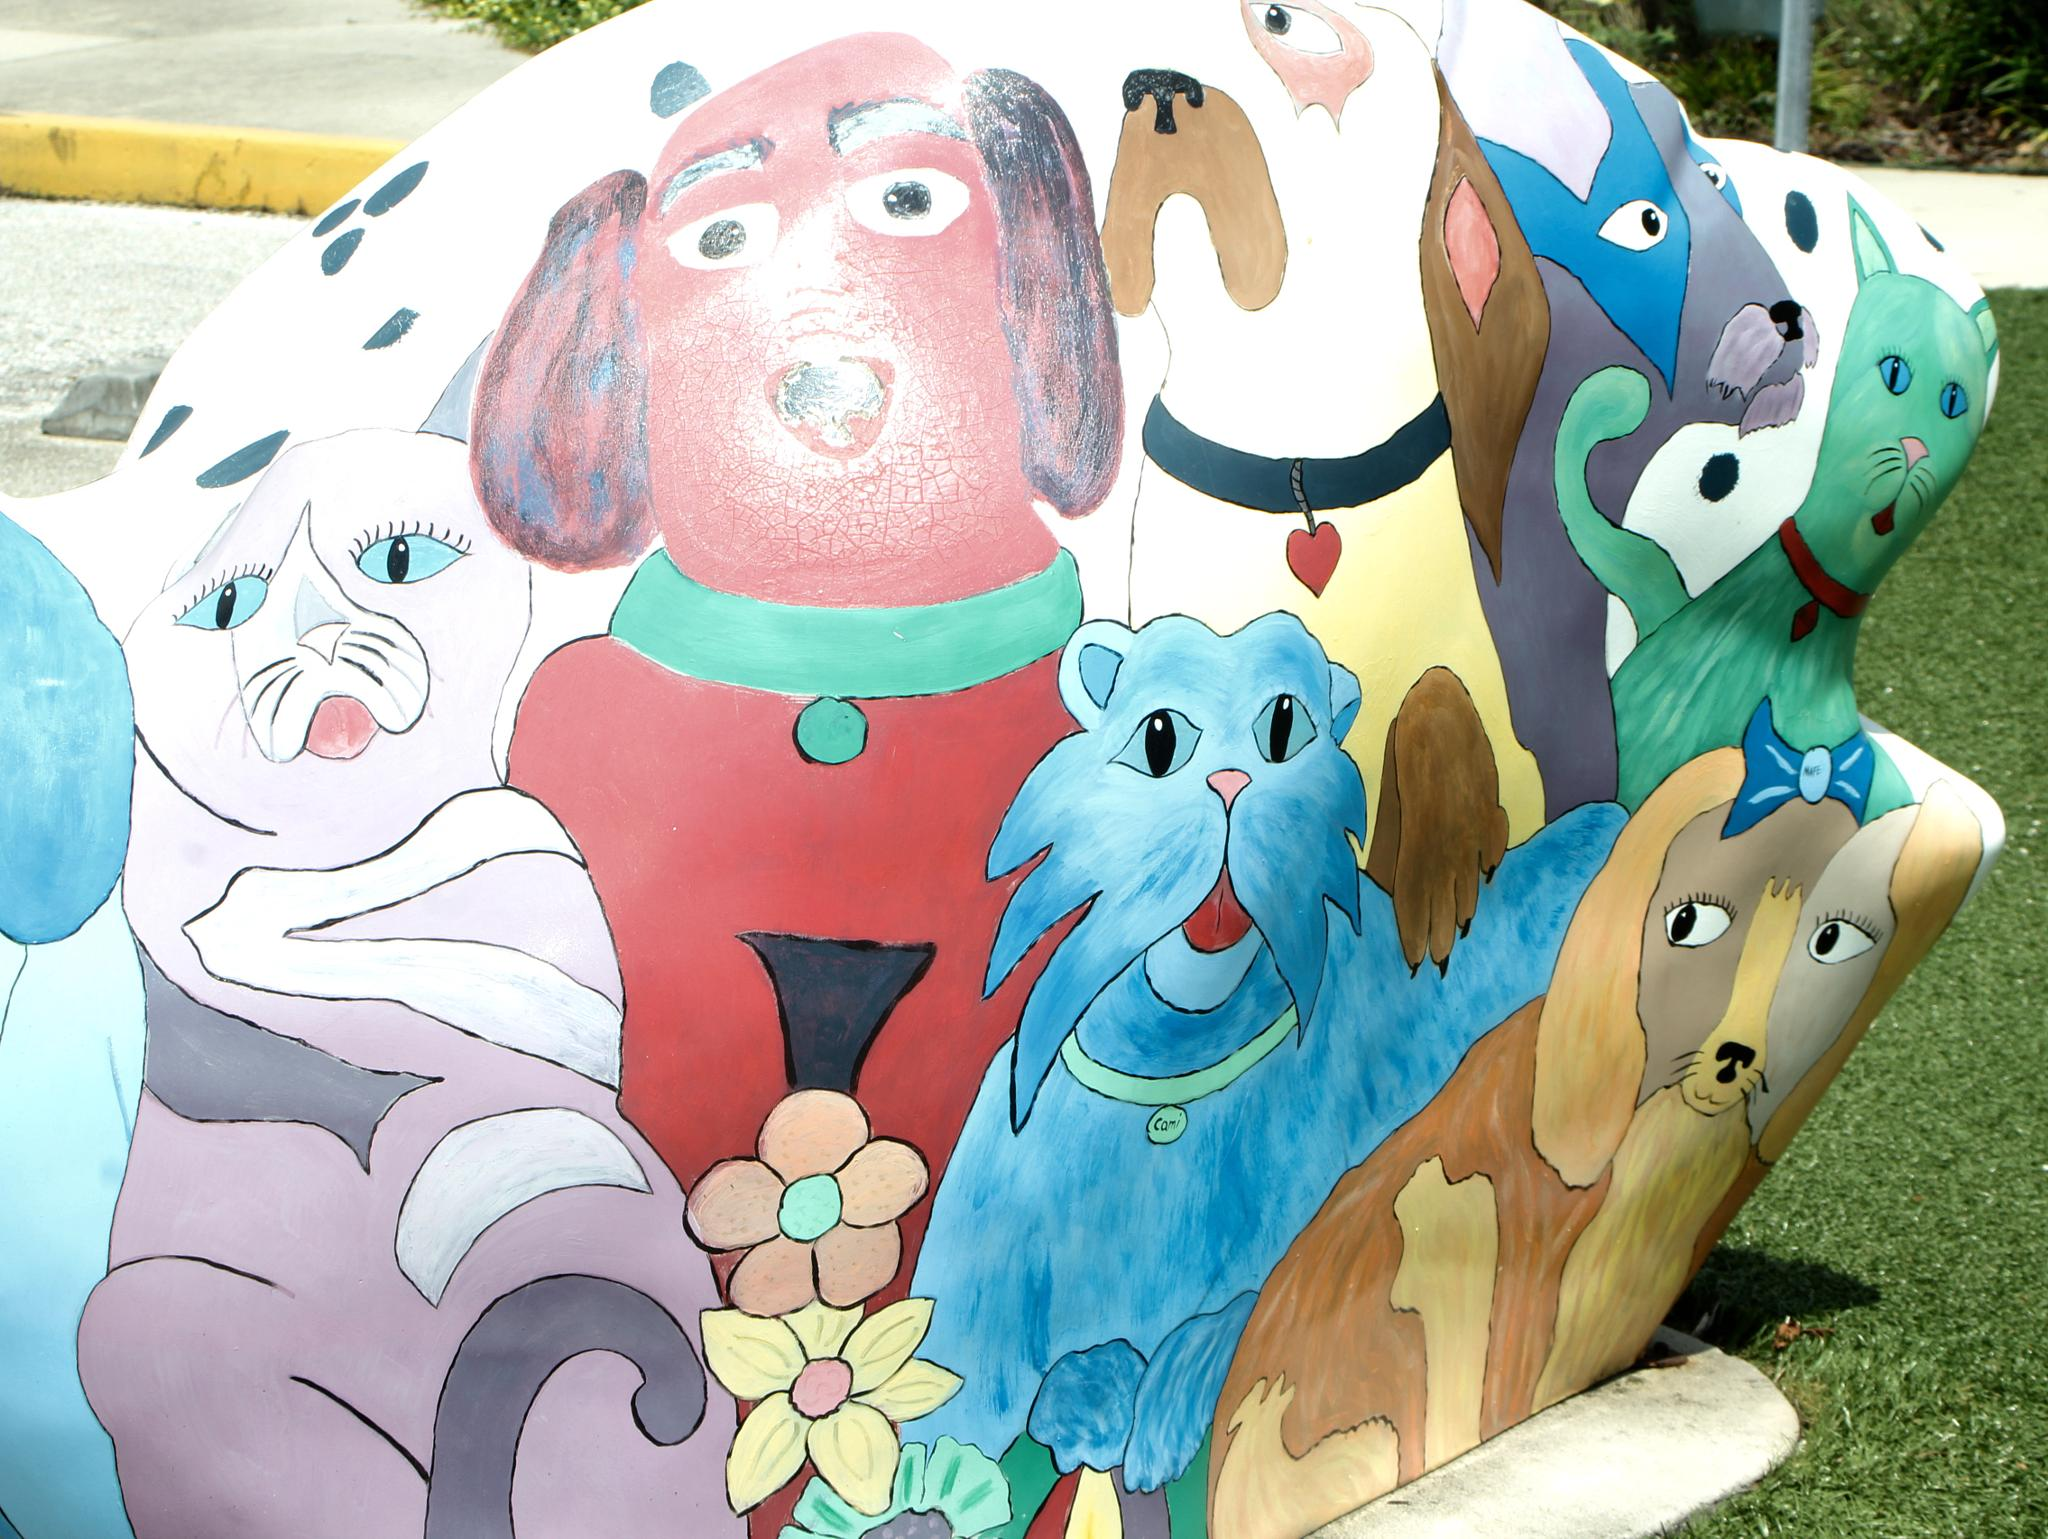 FL SPCA, Lakeland by ckchisum